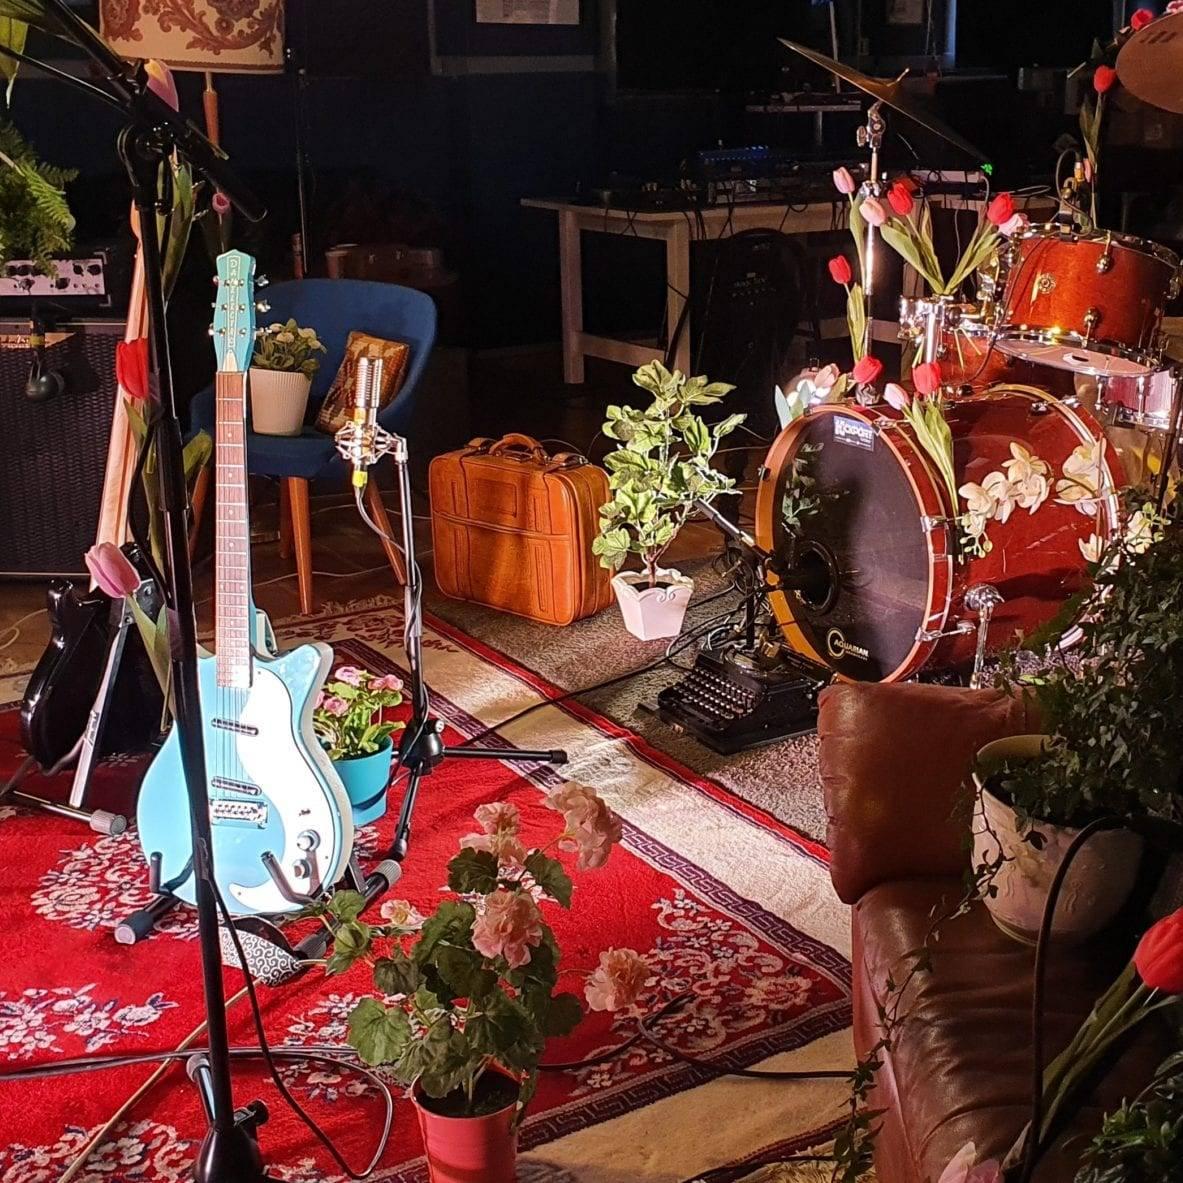 For første gang i historien sendte Ungdommens Hus en konsert live på Facebook tirsdag 7. april. Det var det lokale Røros-bandet DAB som spilte, og mer enn 2000 fulgte den 35 minutter lange sendingen. Foto: Ren Røros Frontal.